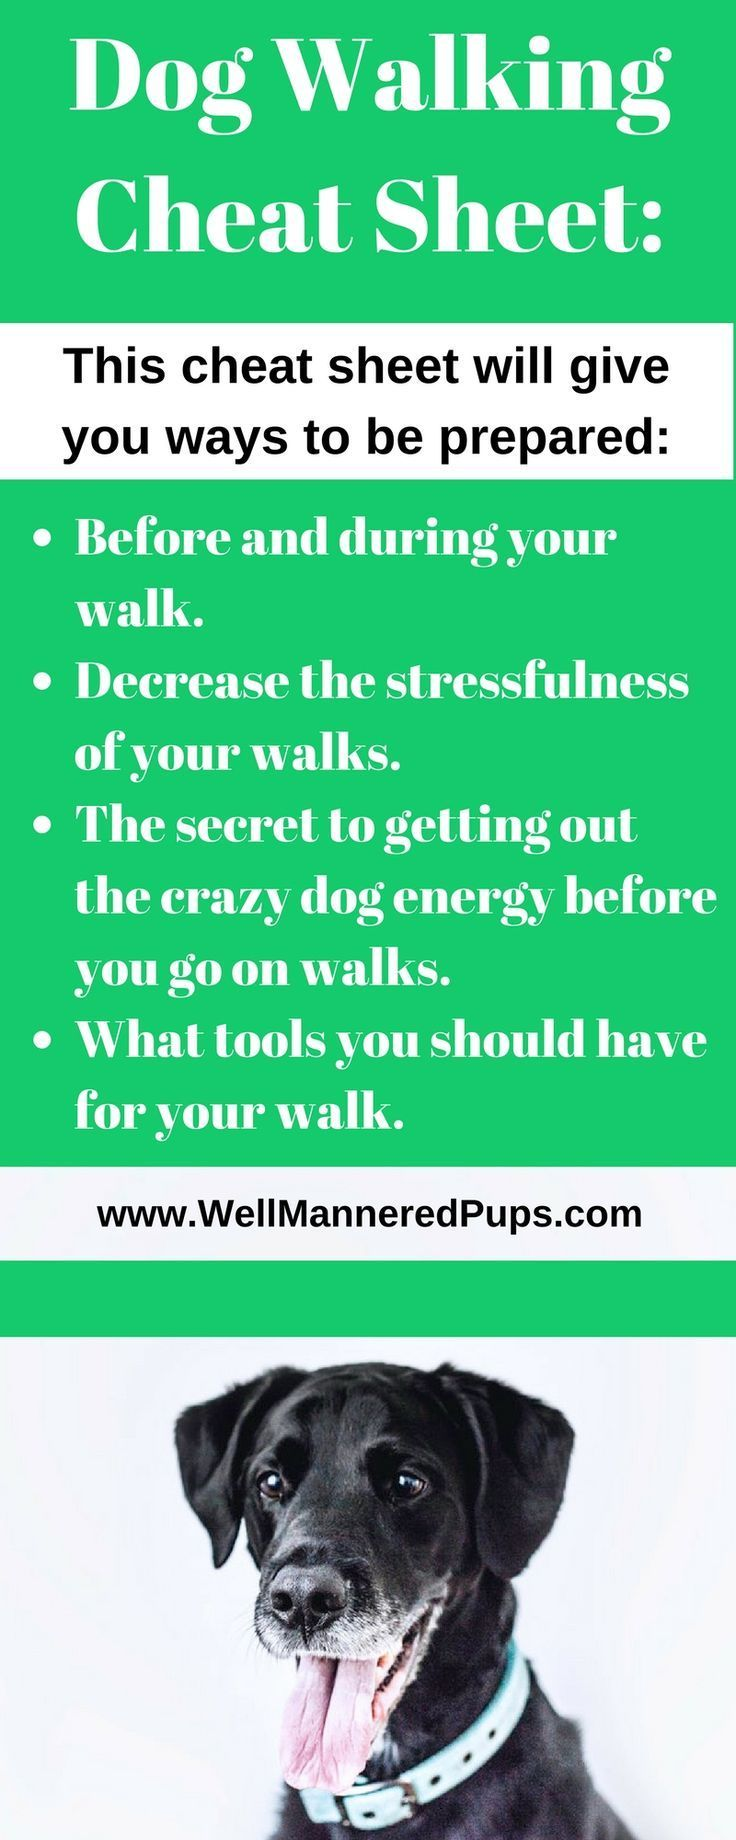 Dog Sitting Tips How To Choose A Good Dog Sitter Dog Walking